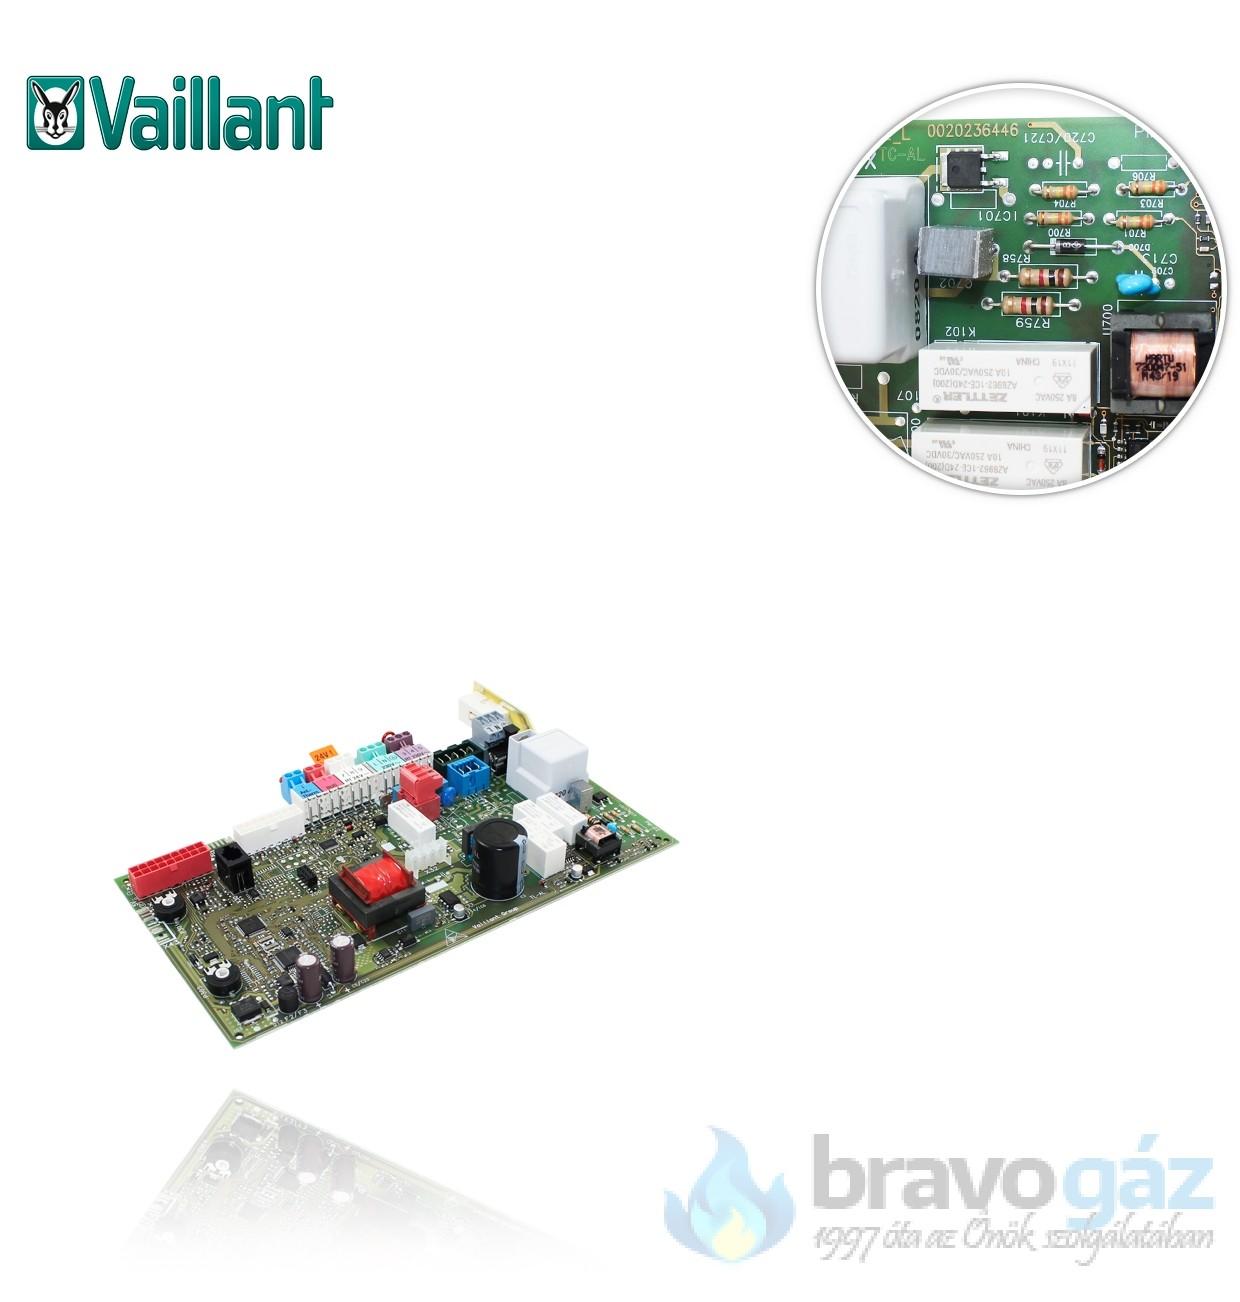 Vaillant panel VU 466/4, 656/4 0020046177